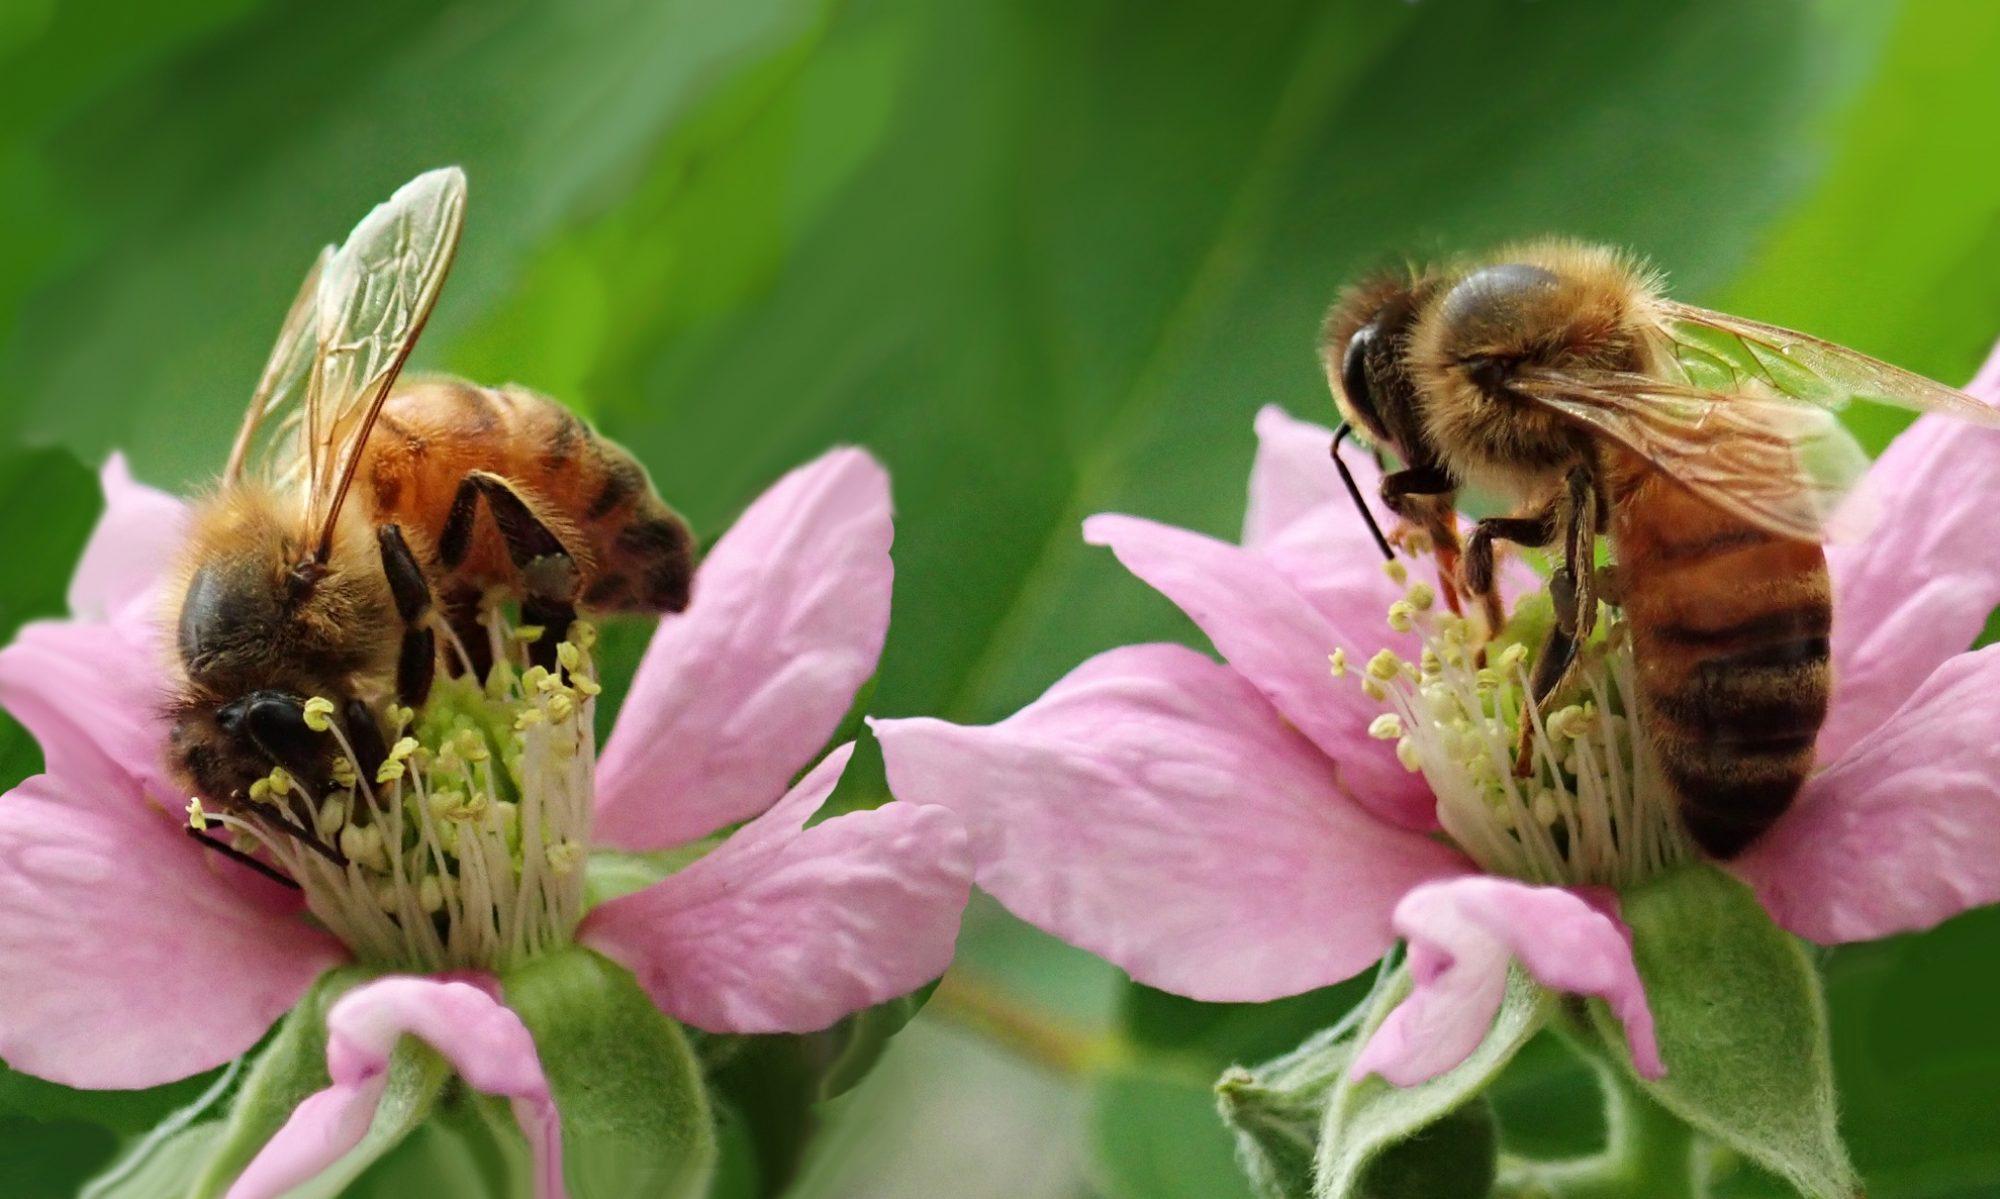 Cirencester Beekeepers